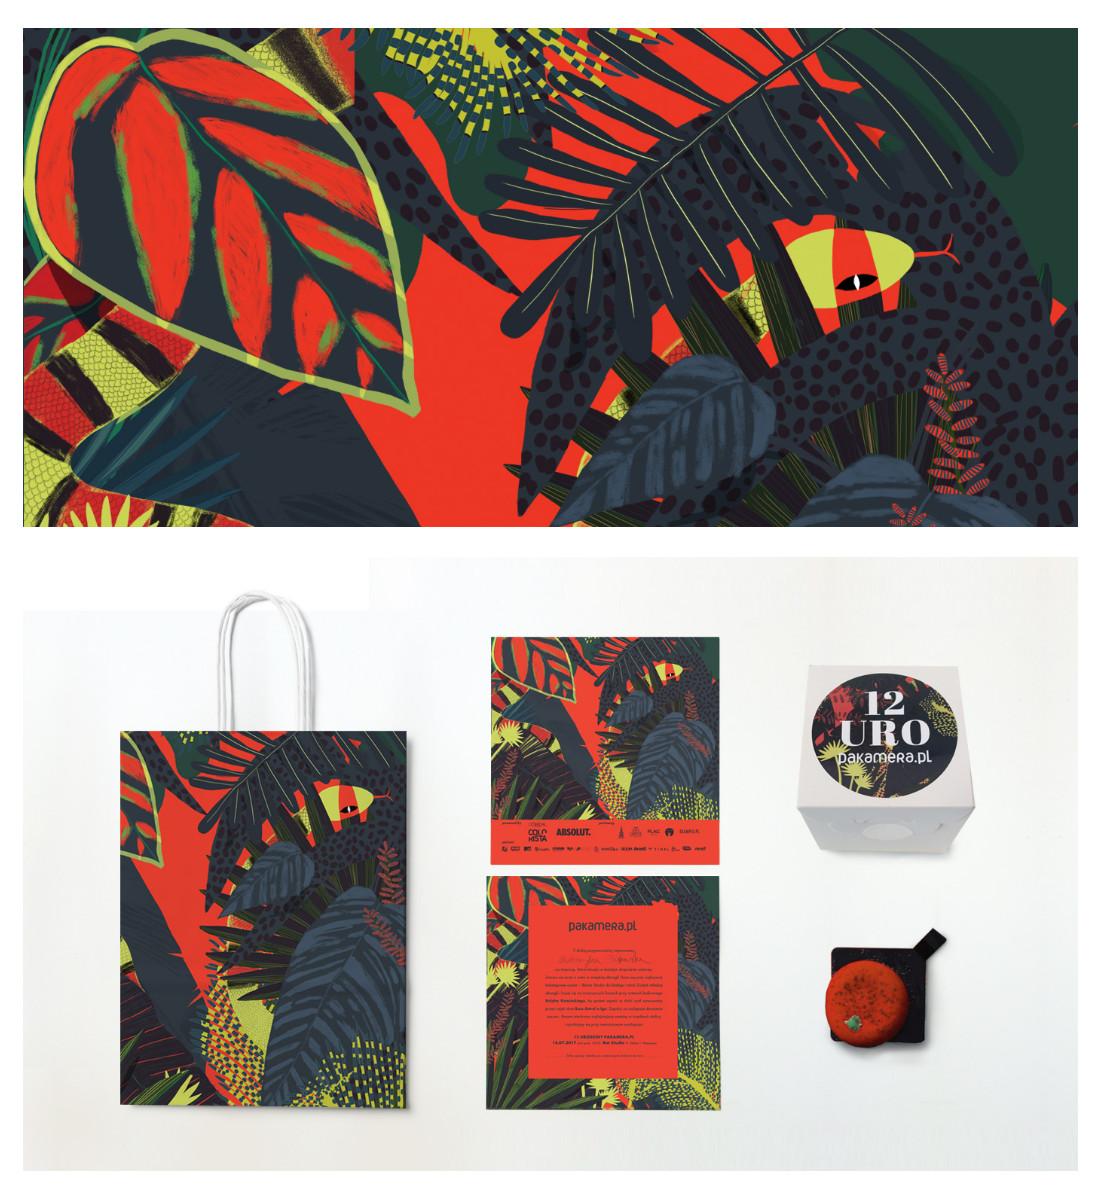 floral-patterns - graphic design patterns